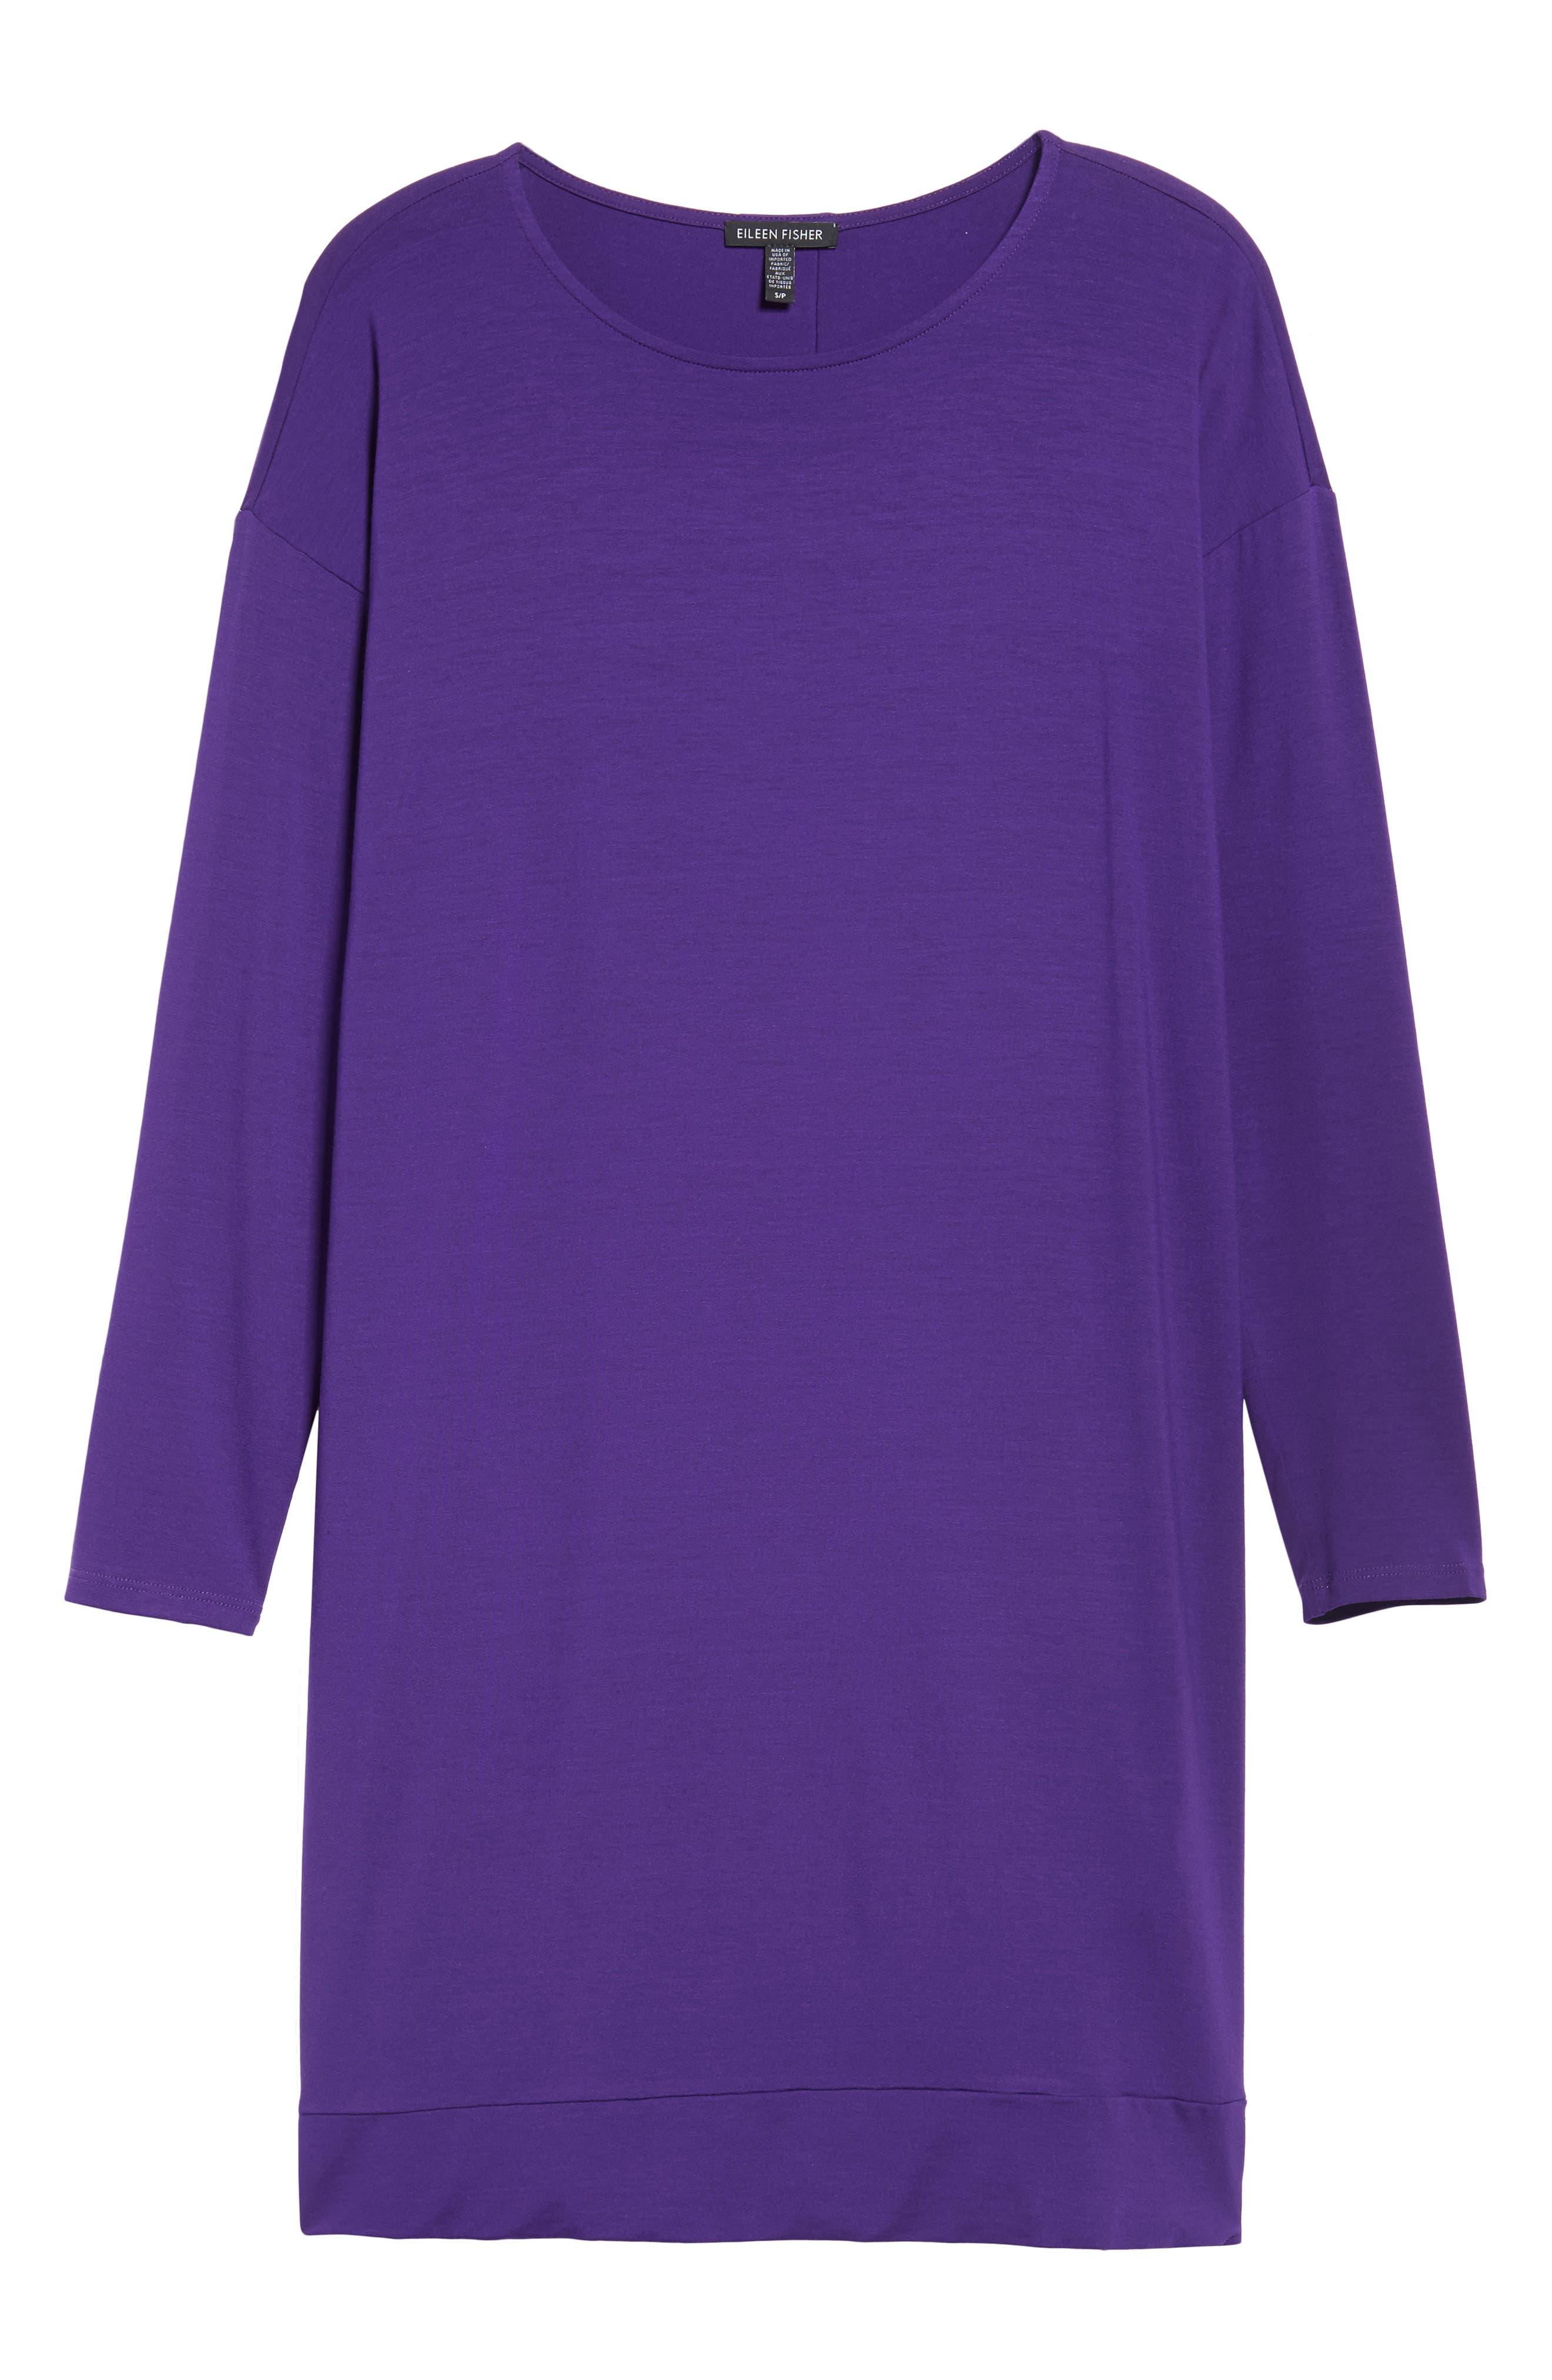 Alternate Image 1 Selected - Eileen Fisher Long Sleeve Jersey Shift Dress (Regular & Petite)